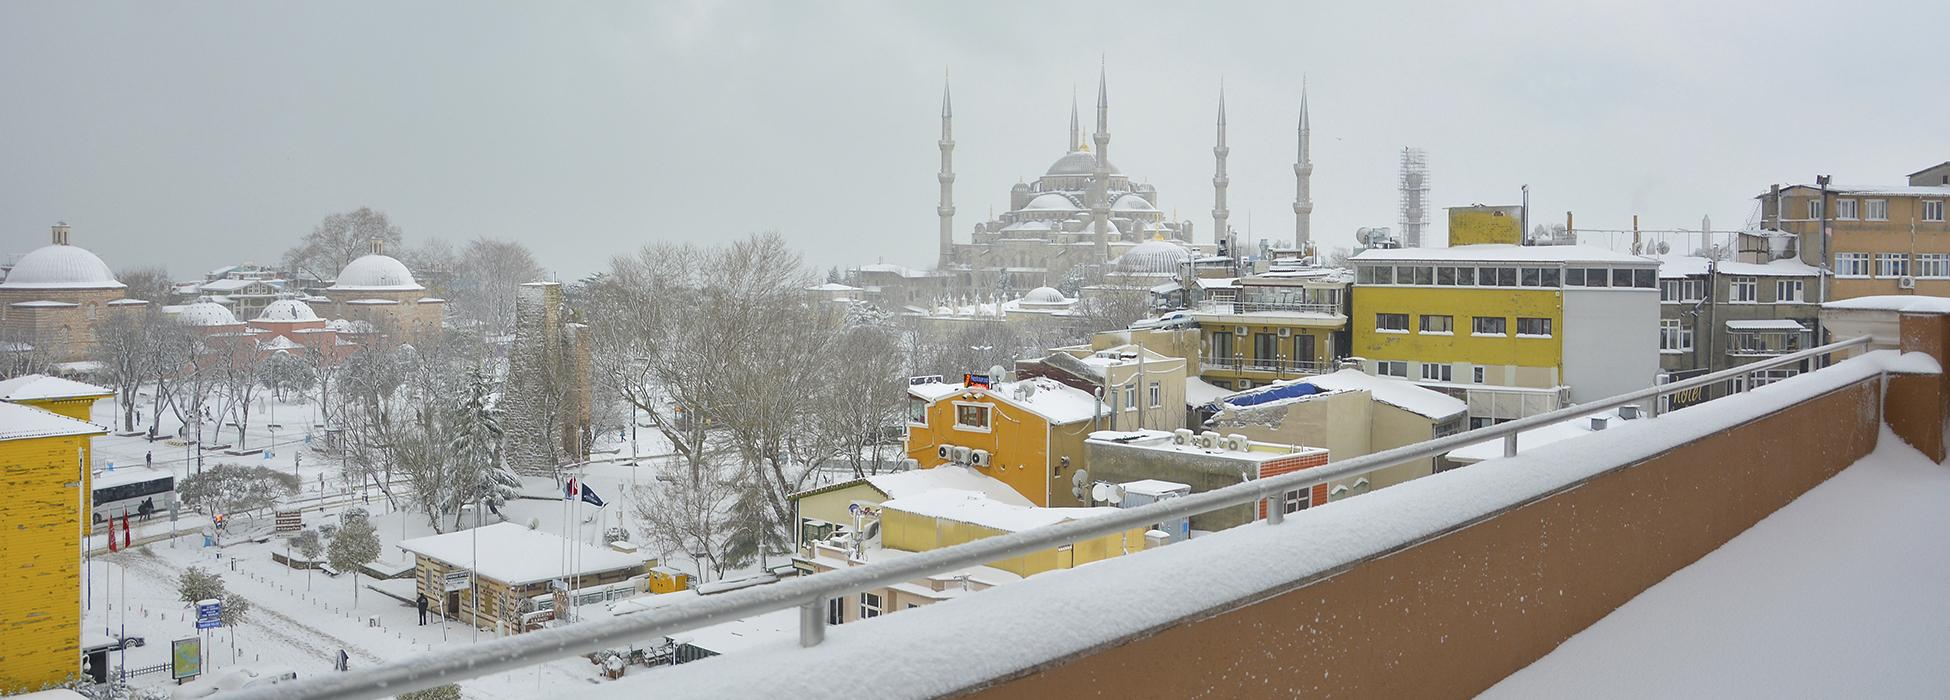 Türkei, Istanbul, And Hotel